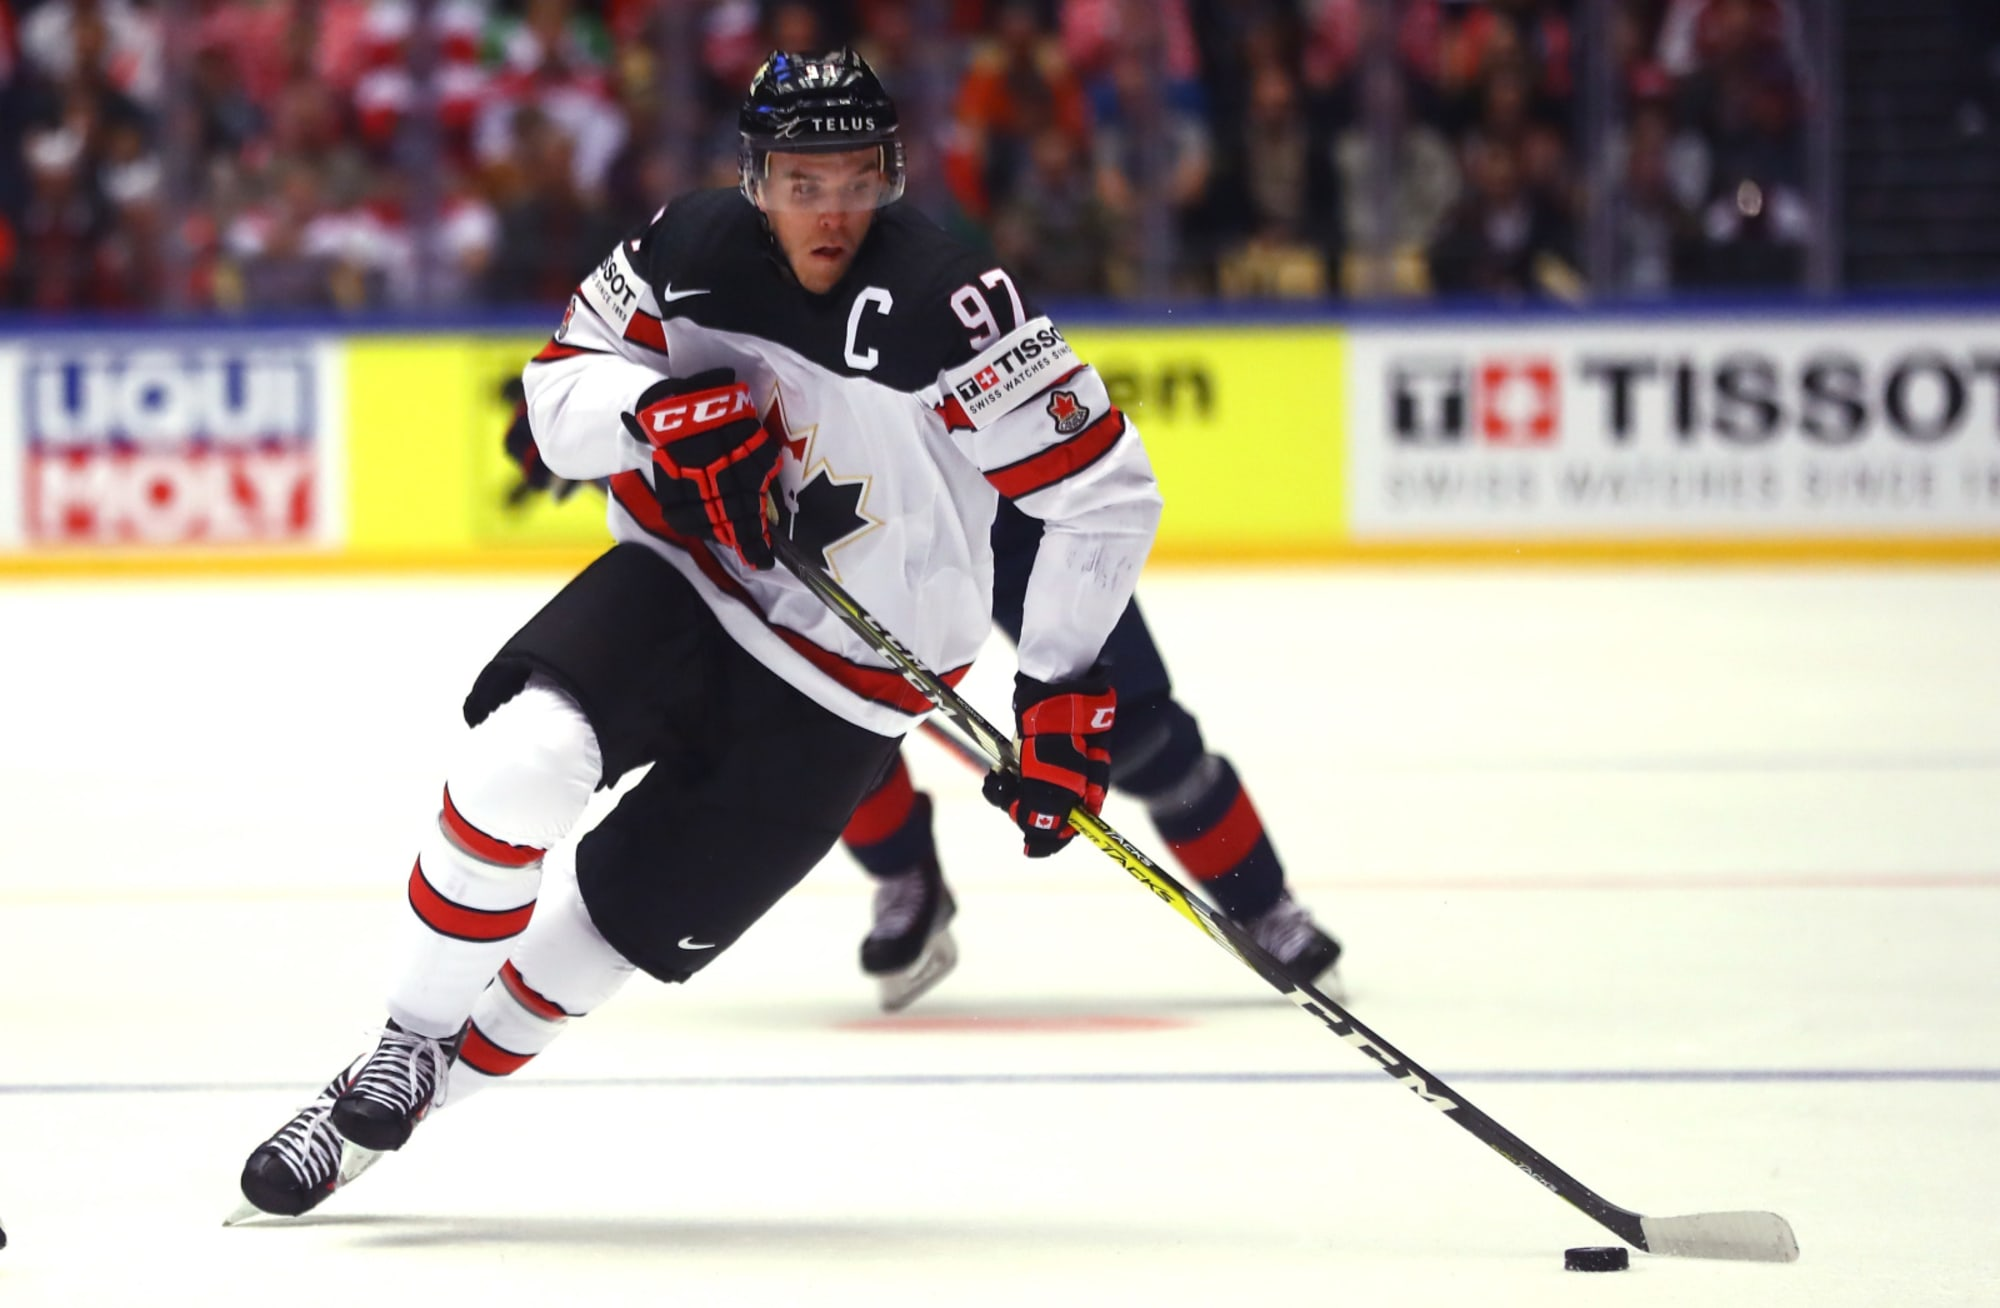 Connor McDavid Leads Team Canada To Win Over Korea